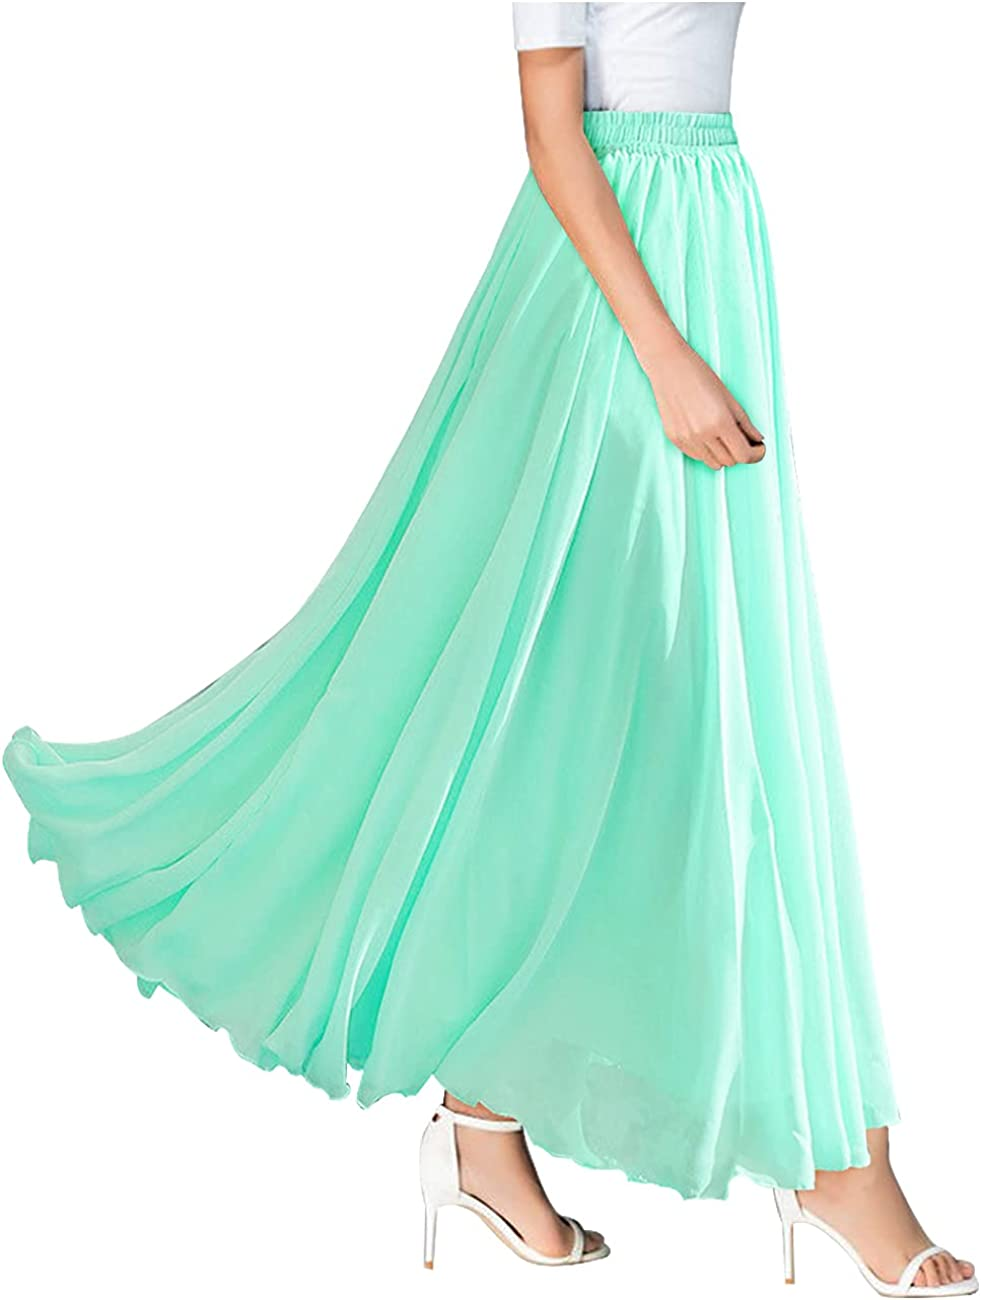 Joukavor Women's Chiffon Maxi Long Skirt Casual Flowy Pleated Skirts